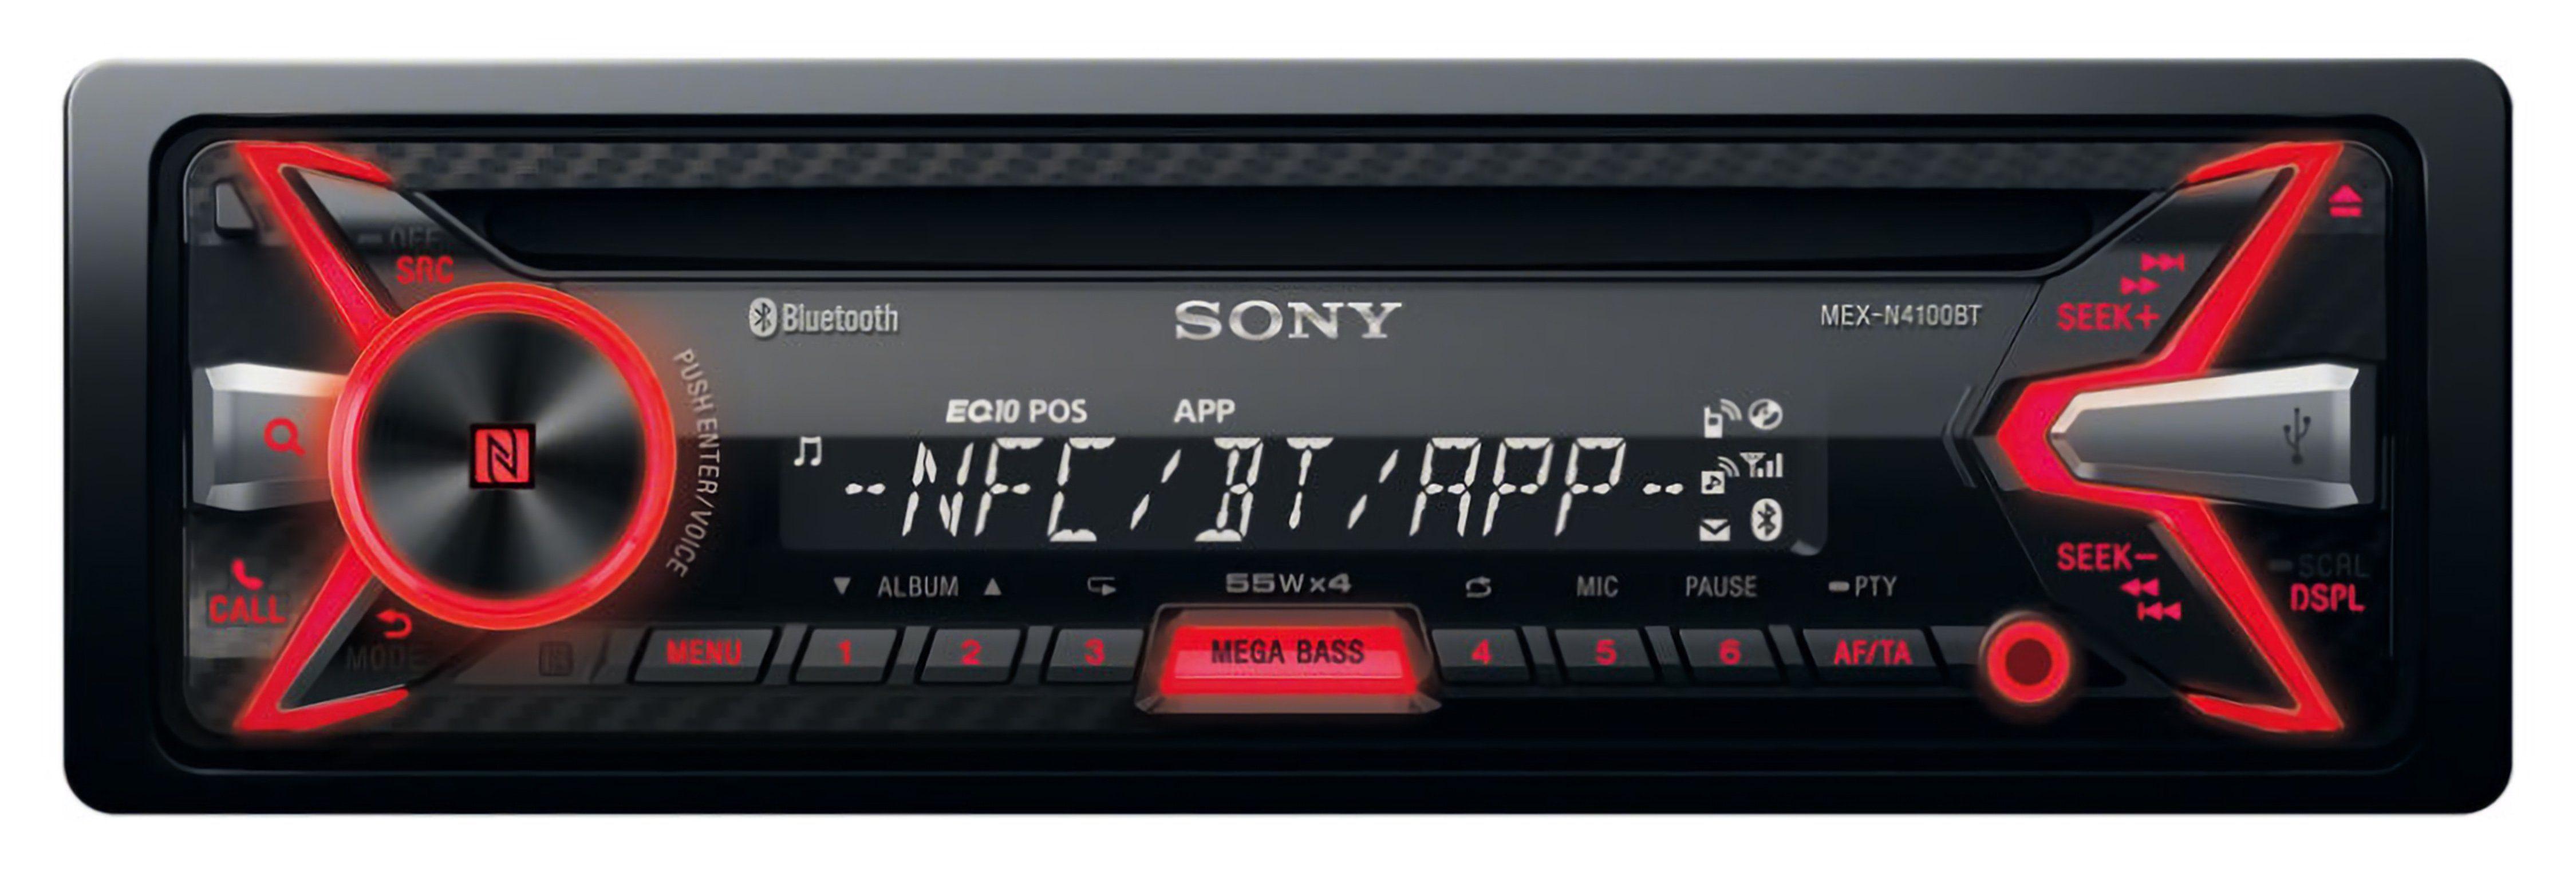 Sony 1-DIN Media Receiver mit Bluetooth »MEX-N4100BT«